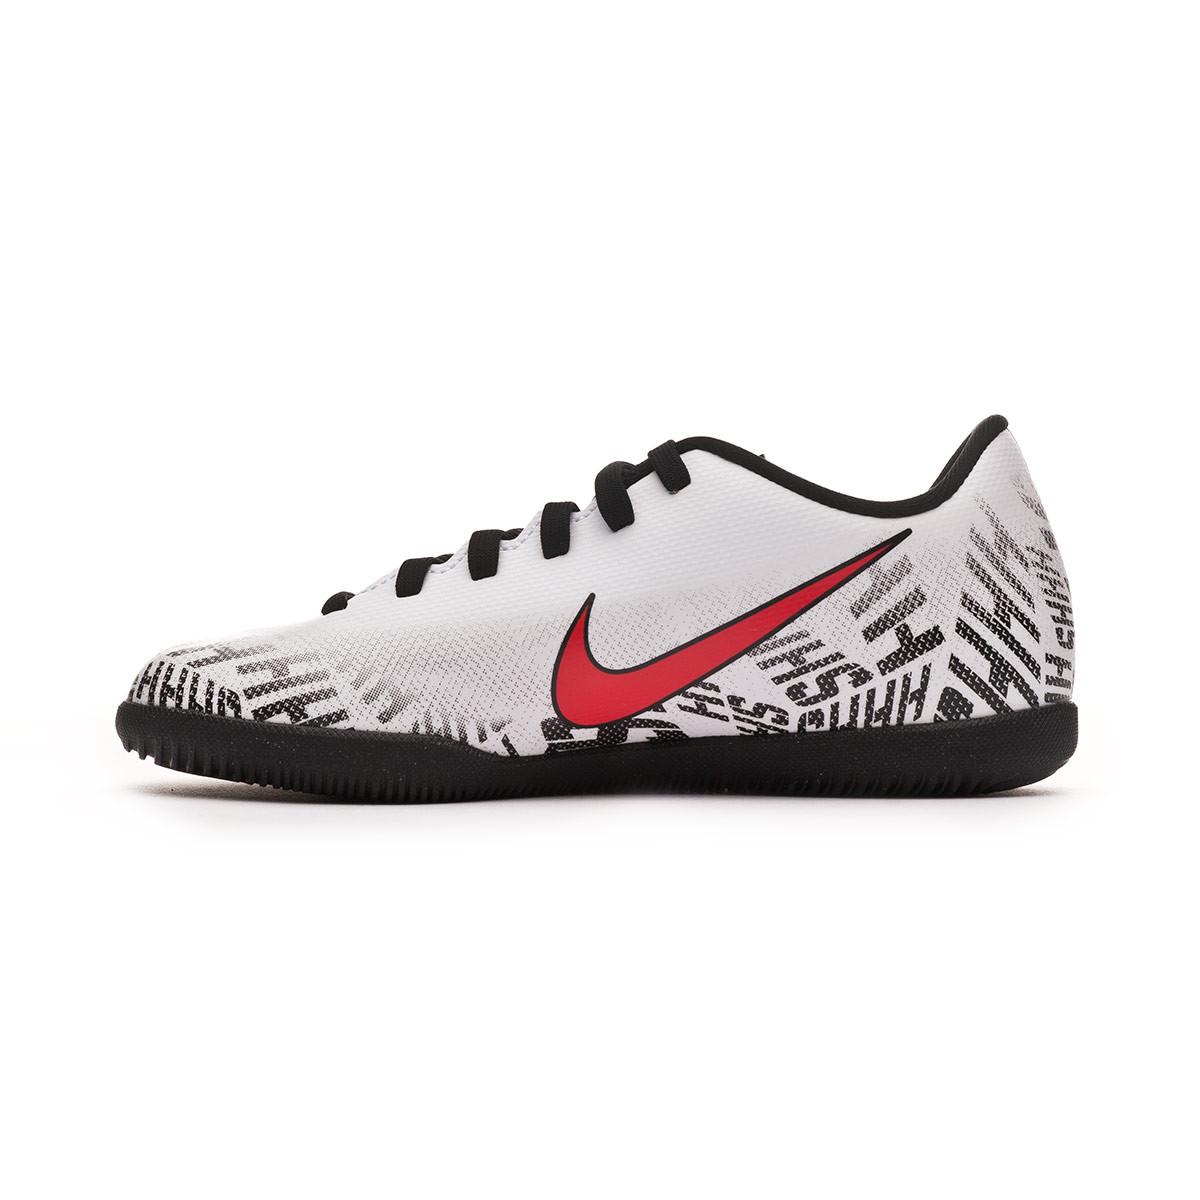 cc0dcb50689e Futsal Boot Nike Mercurial Vapor XII Club Neymar Jr IC Niño White-Challenge  red-Black - Football store Fútbol Emotion